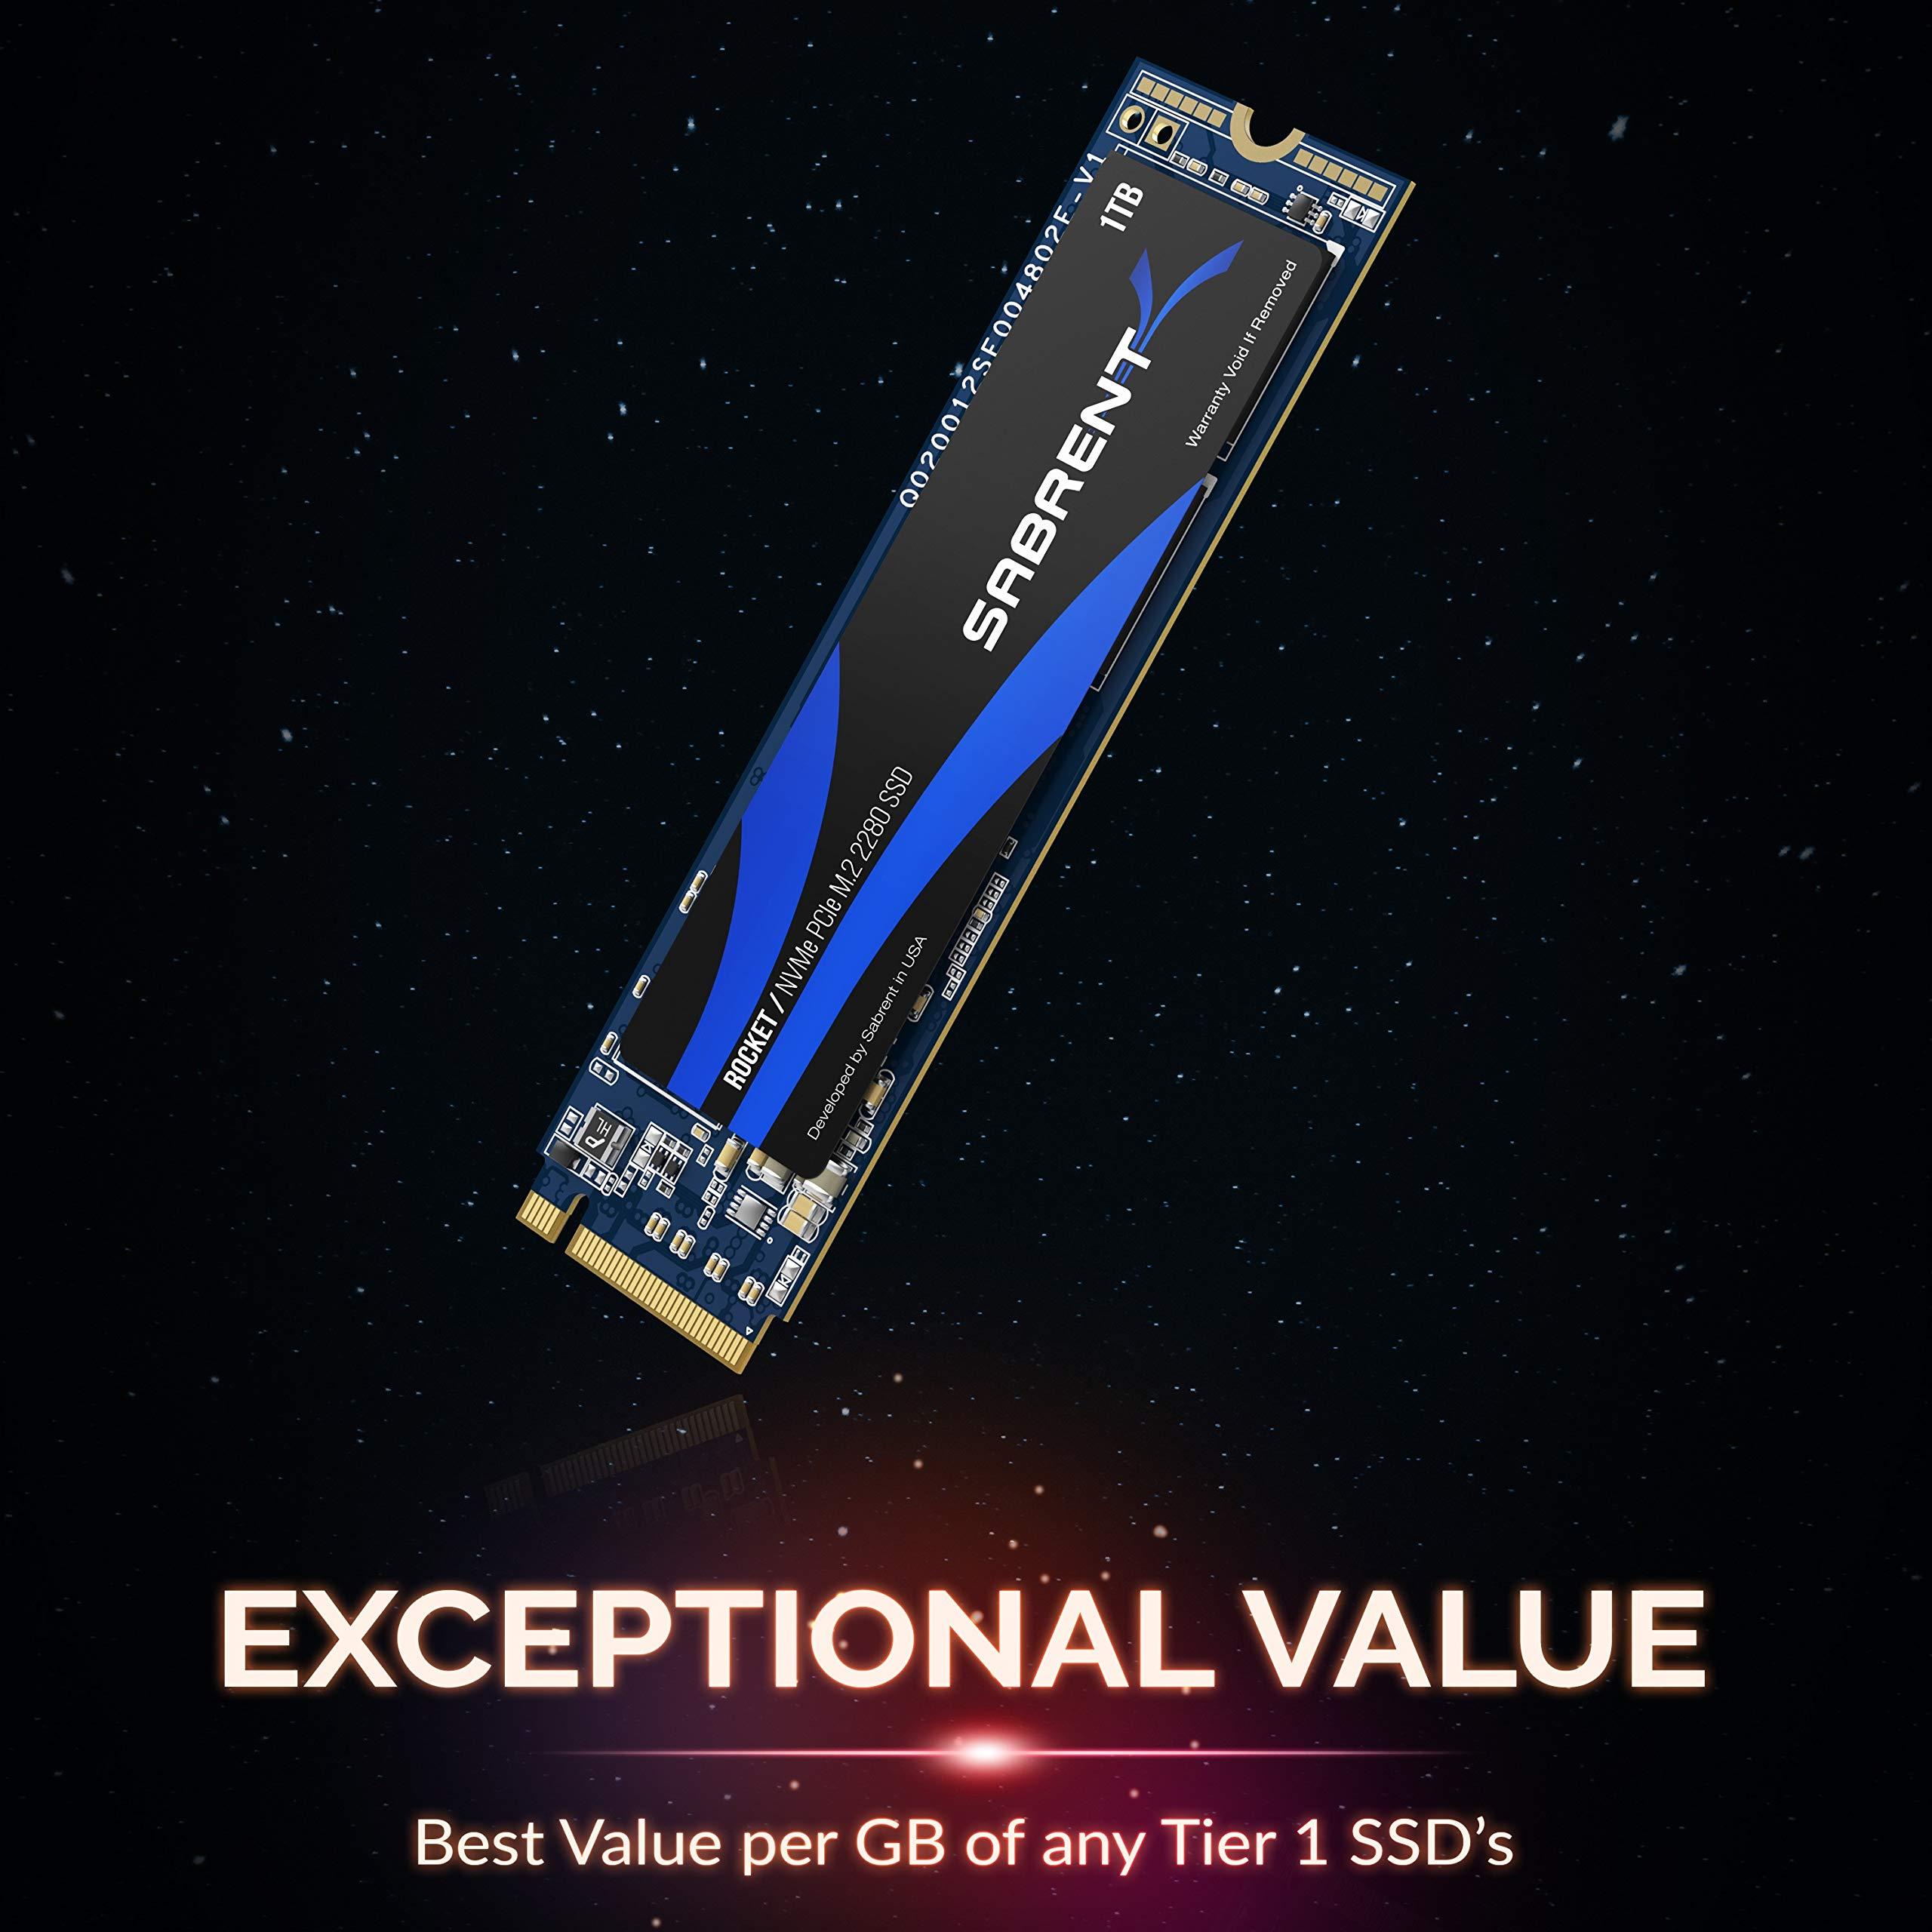 Sabrent 1TB Rocket NVMe PCIe M.2 2280 Internal SSD High Performance Solid State Drive (SB-ROCKET-1TB) by Sabrent (Image #3)